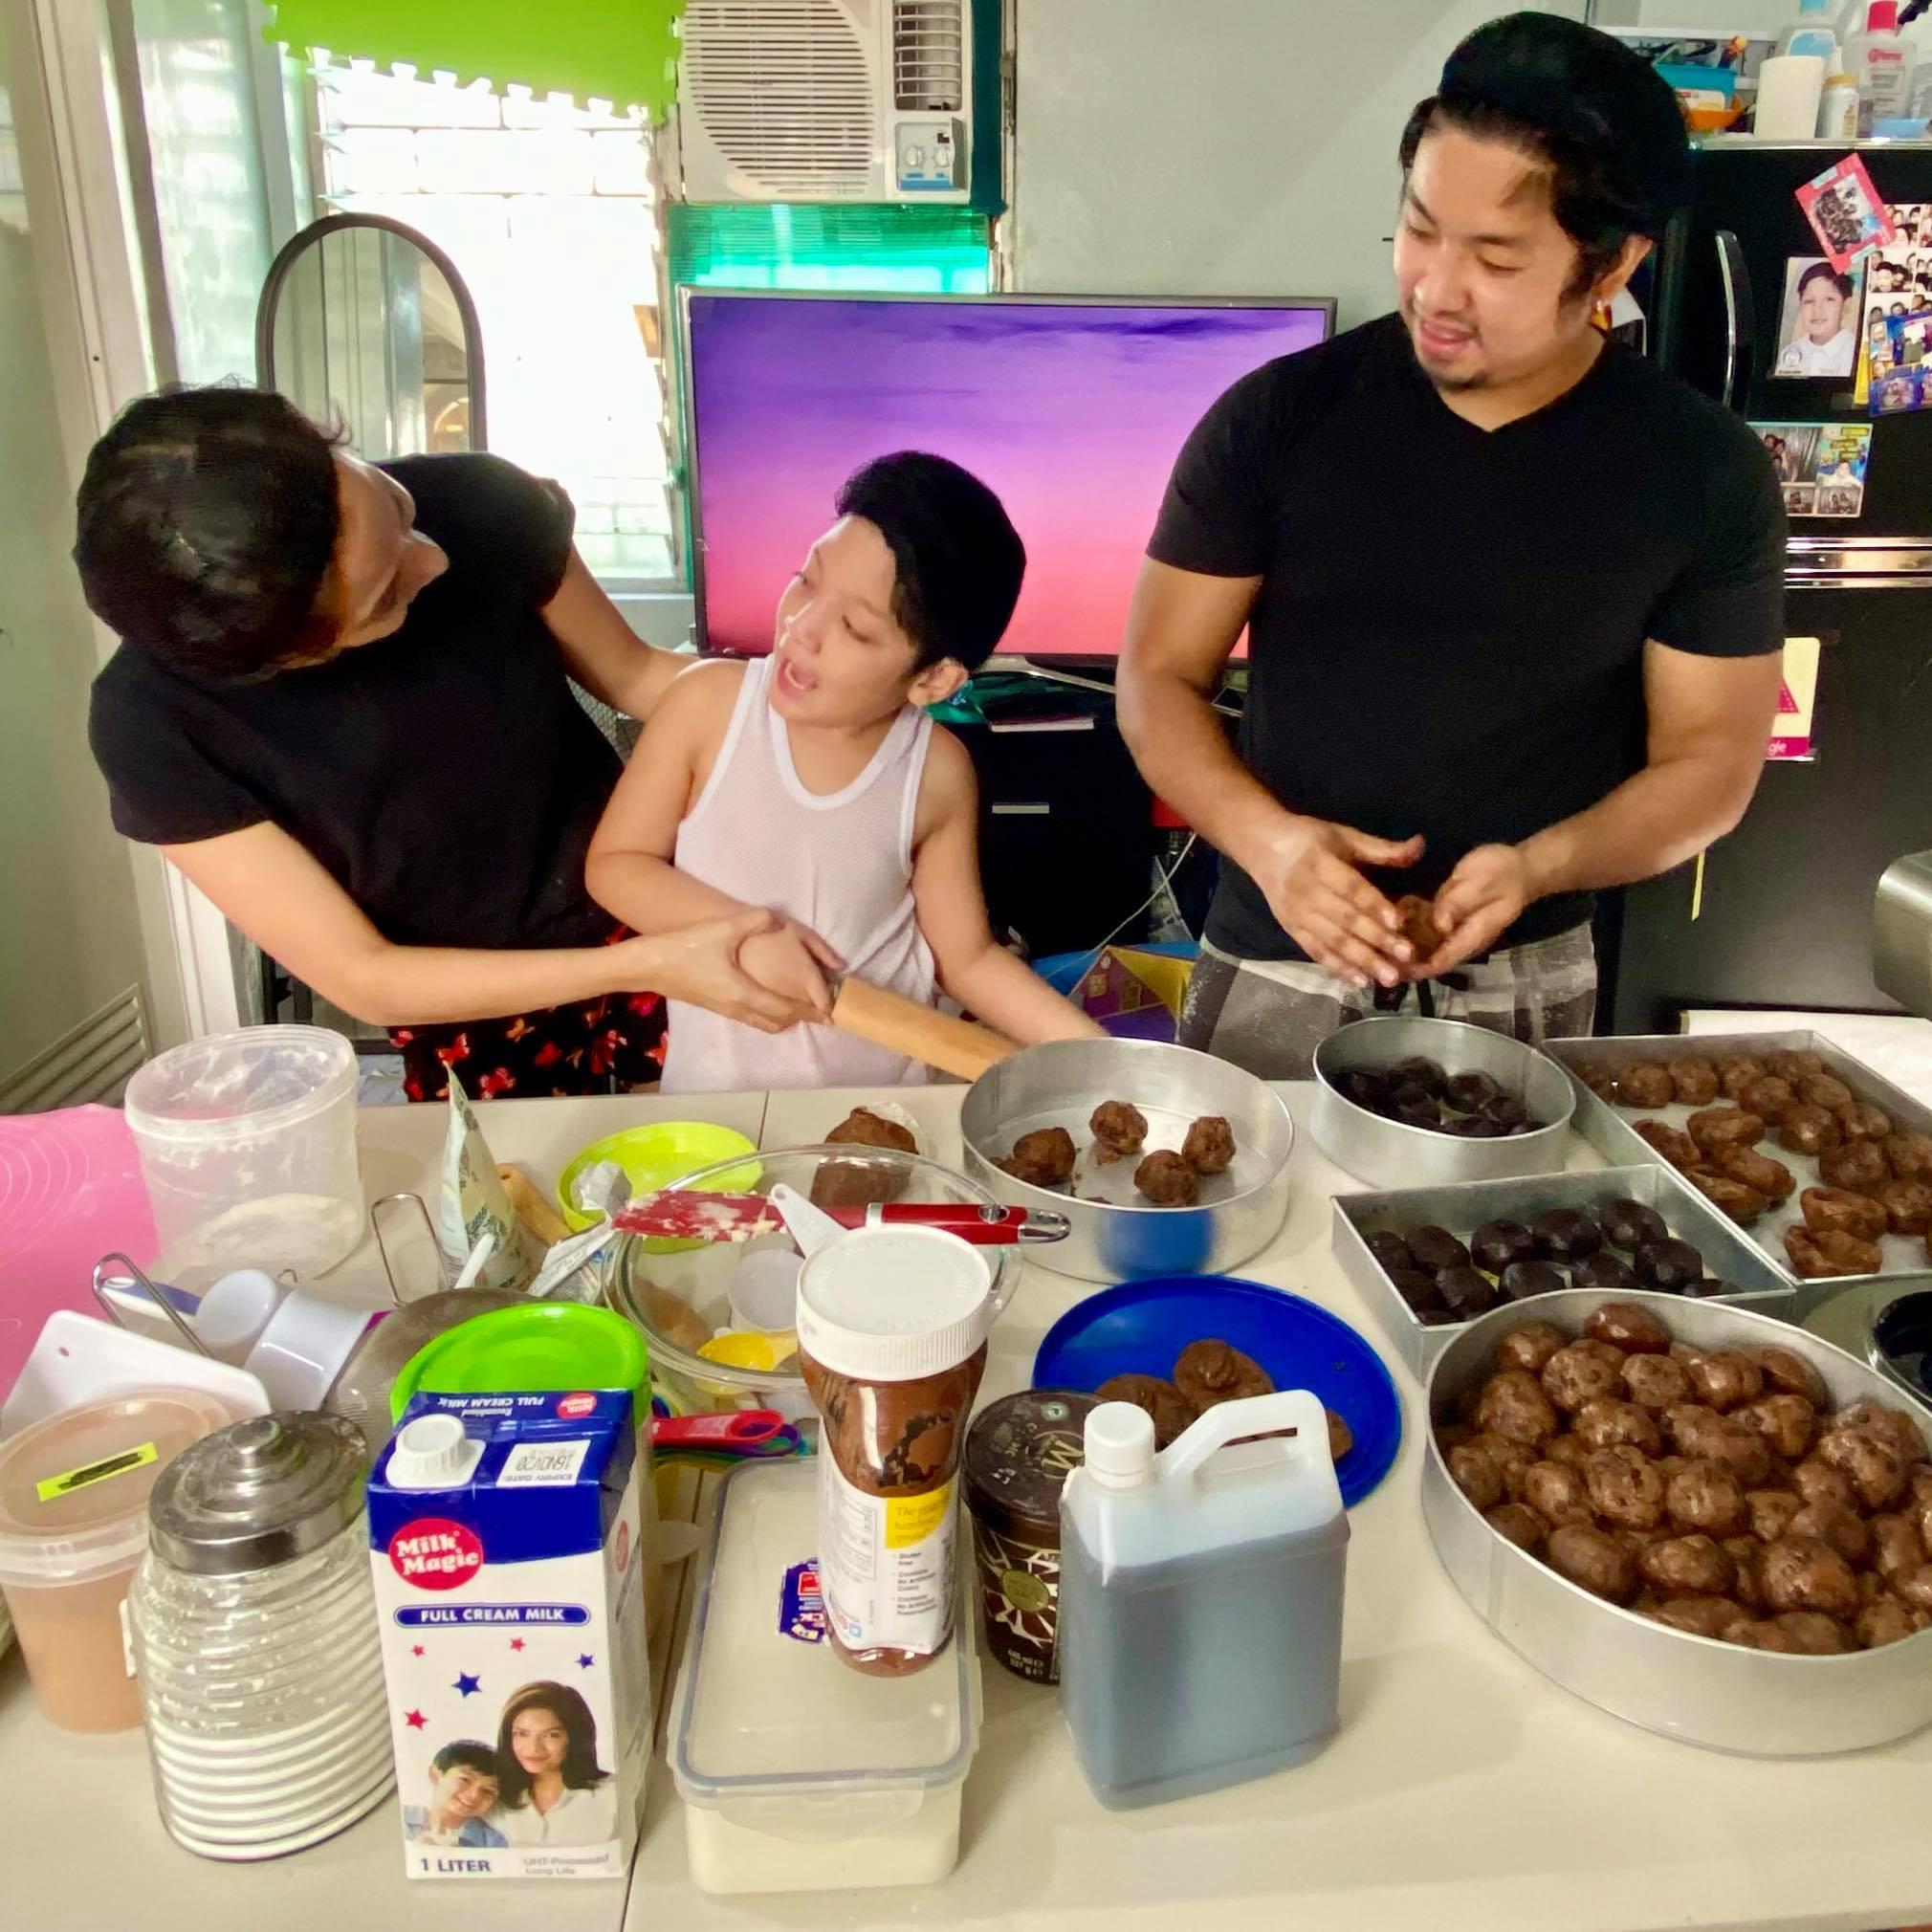 Ella Infante, husband Deen Opella, son Matteo baking